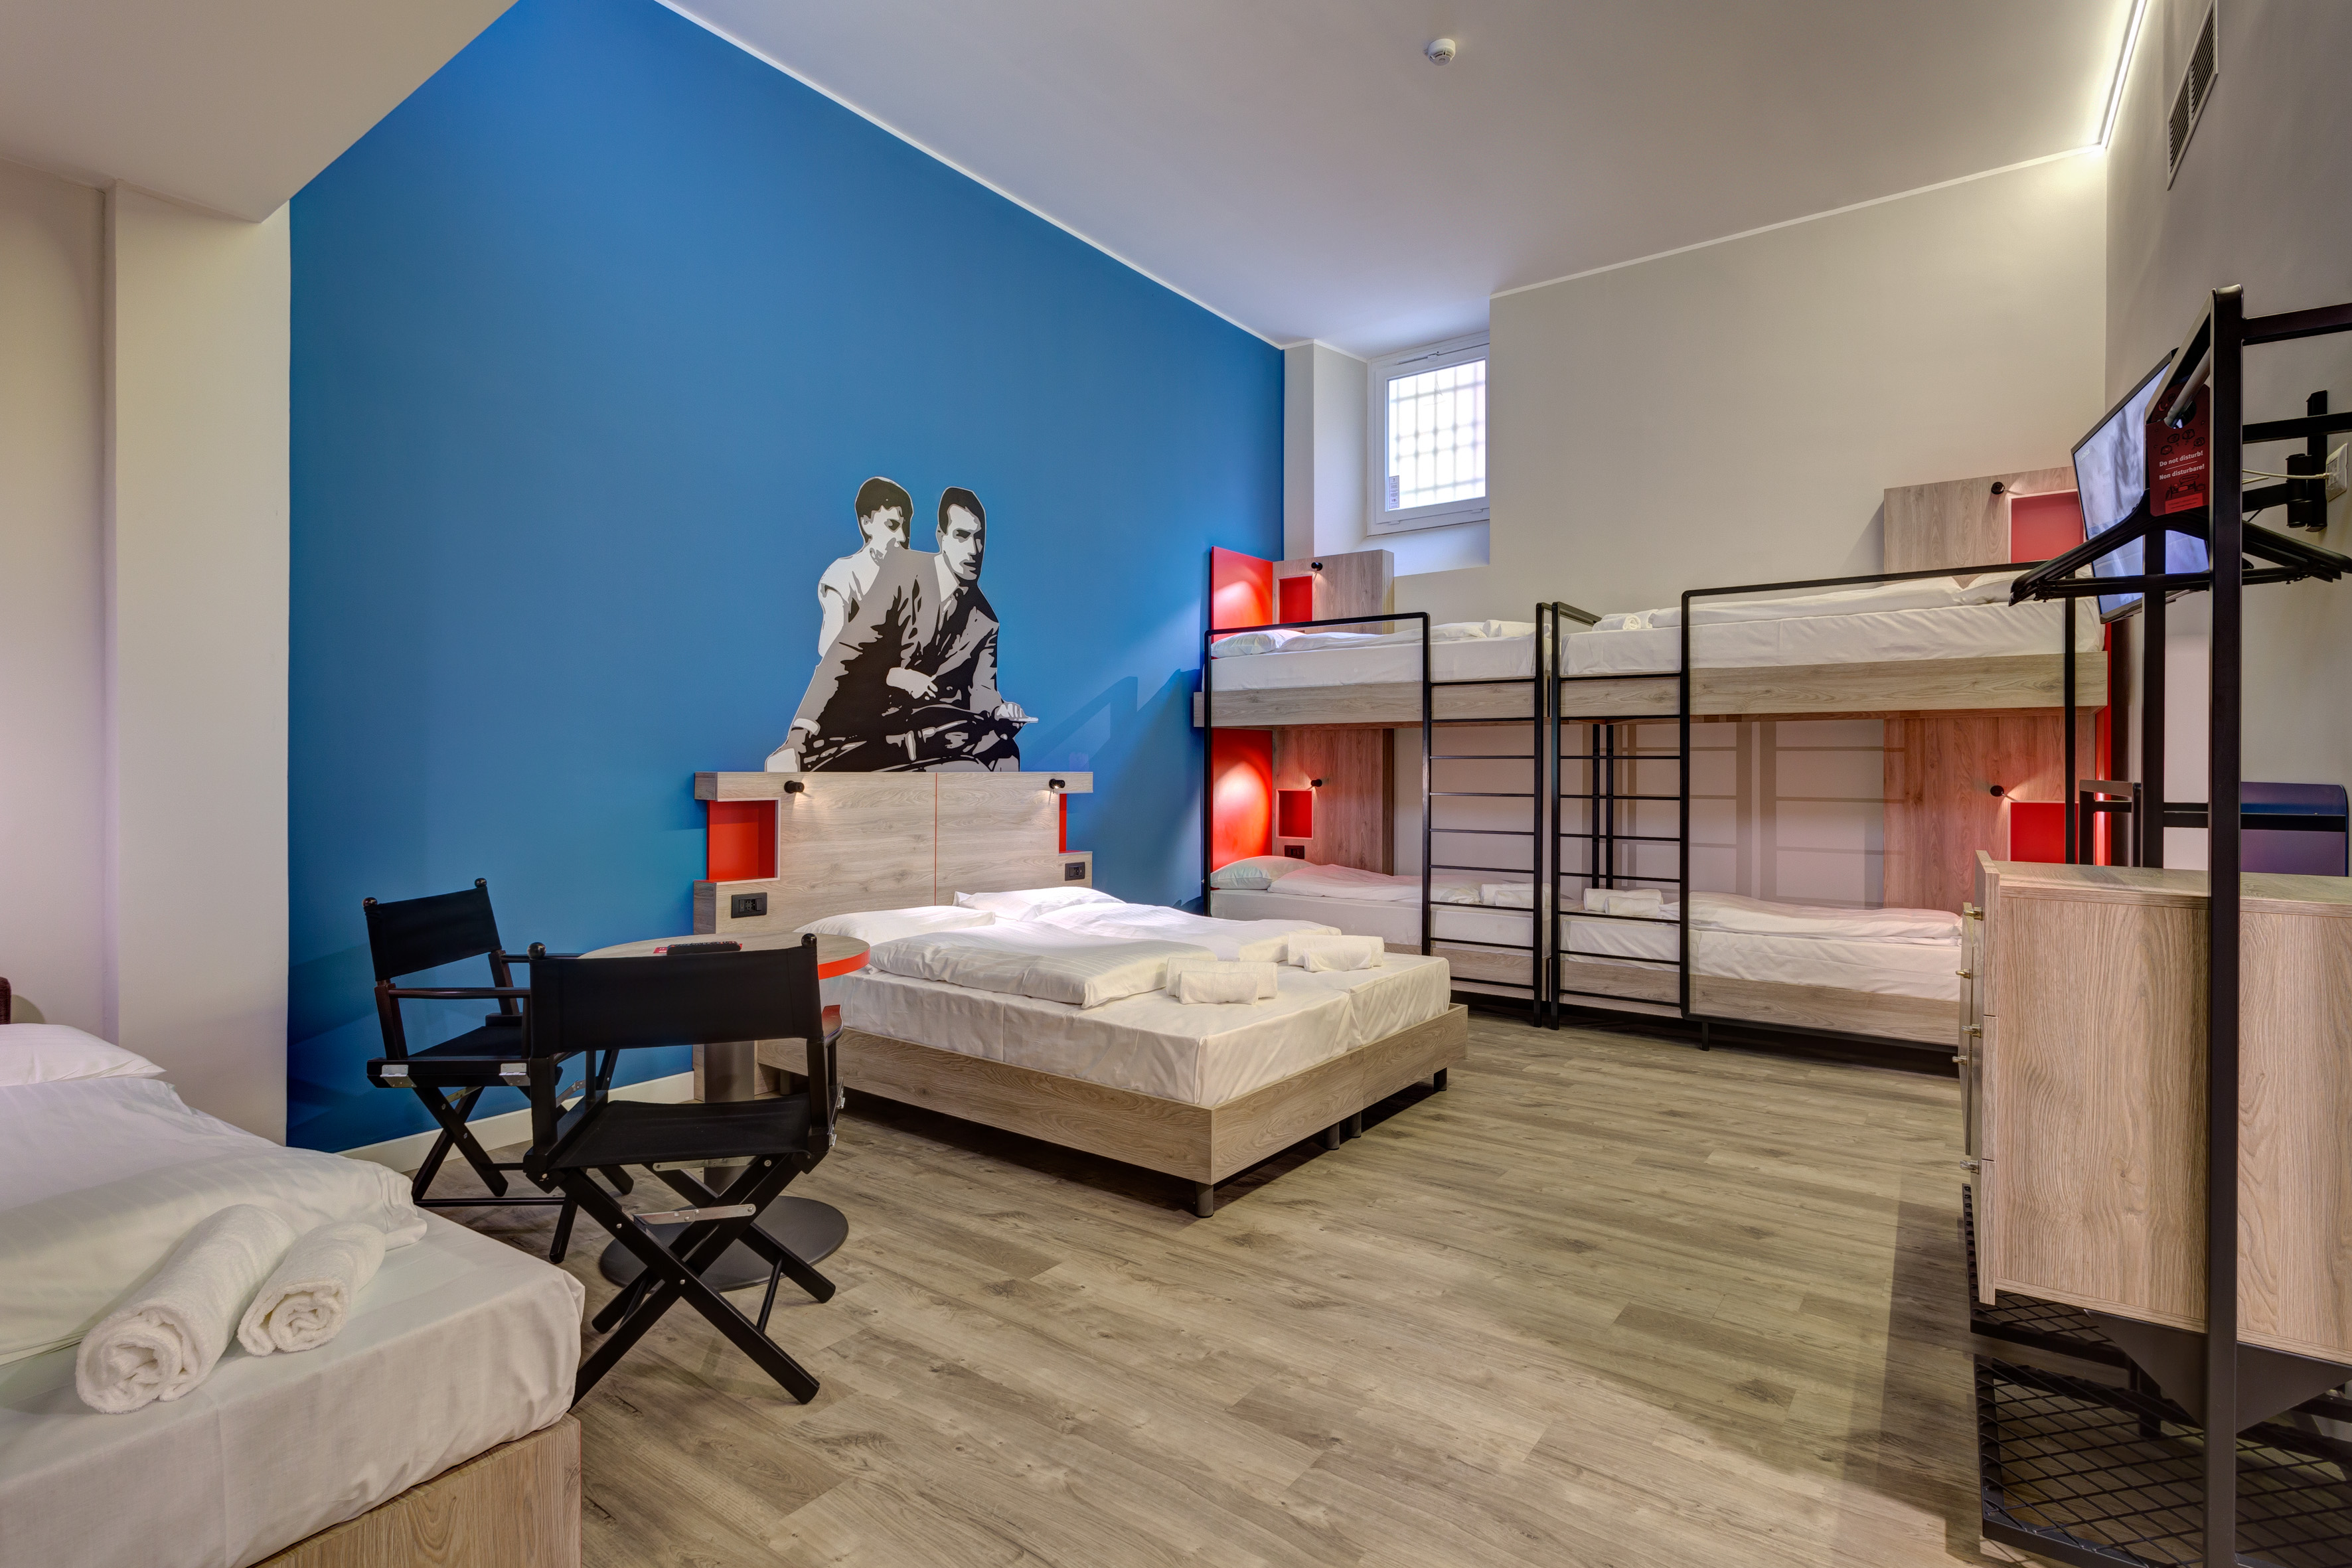 MEININGER Roma Termini - Dormitorio